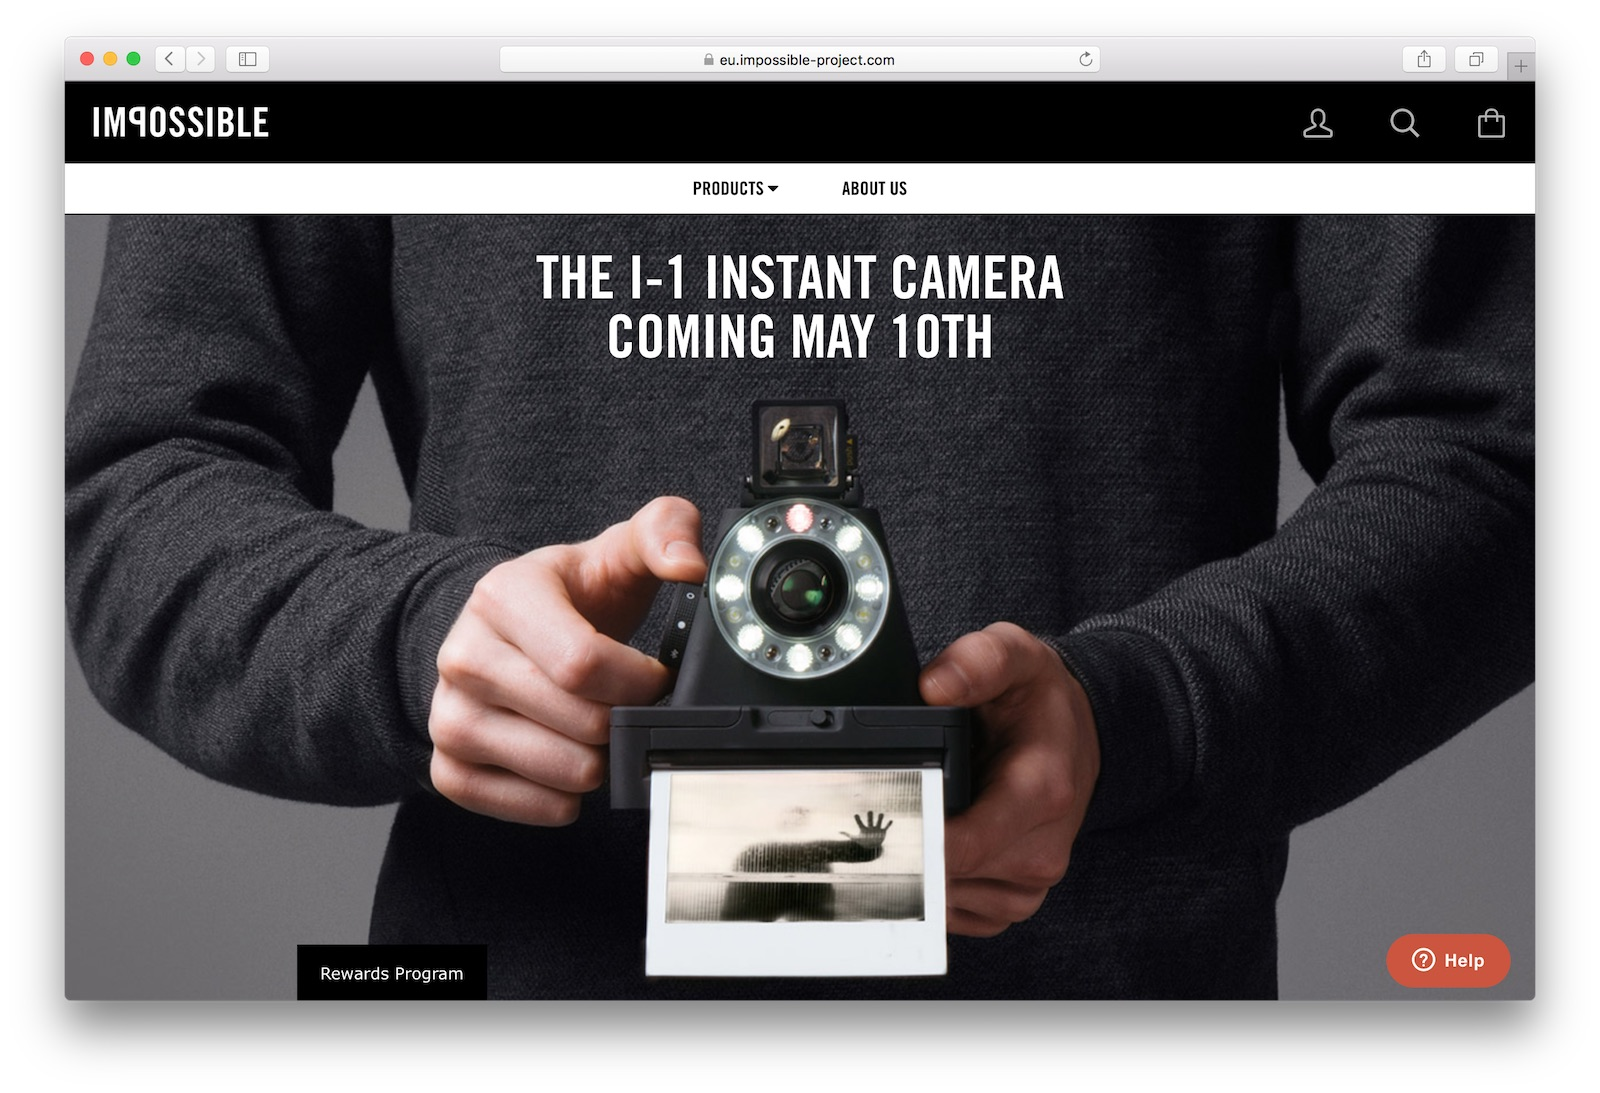 I-1 Analog Instant Camera